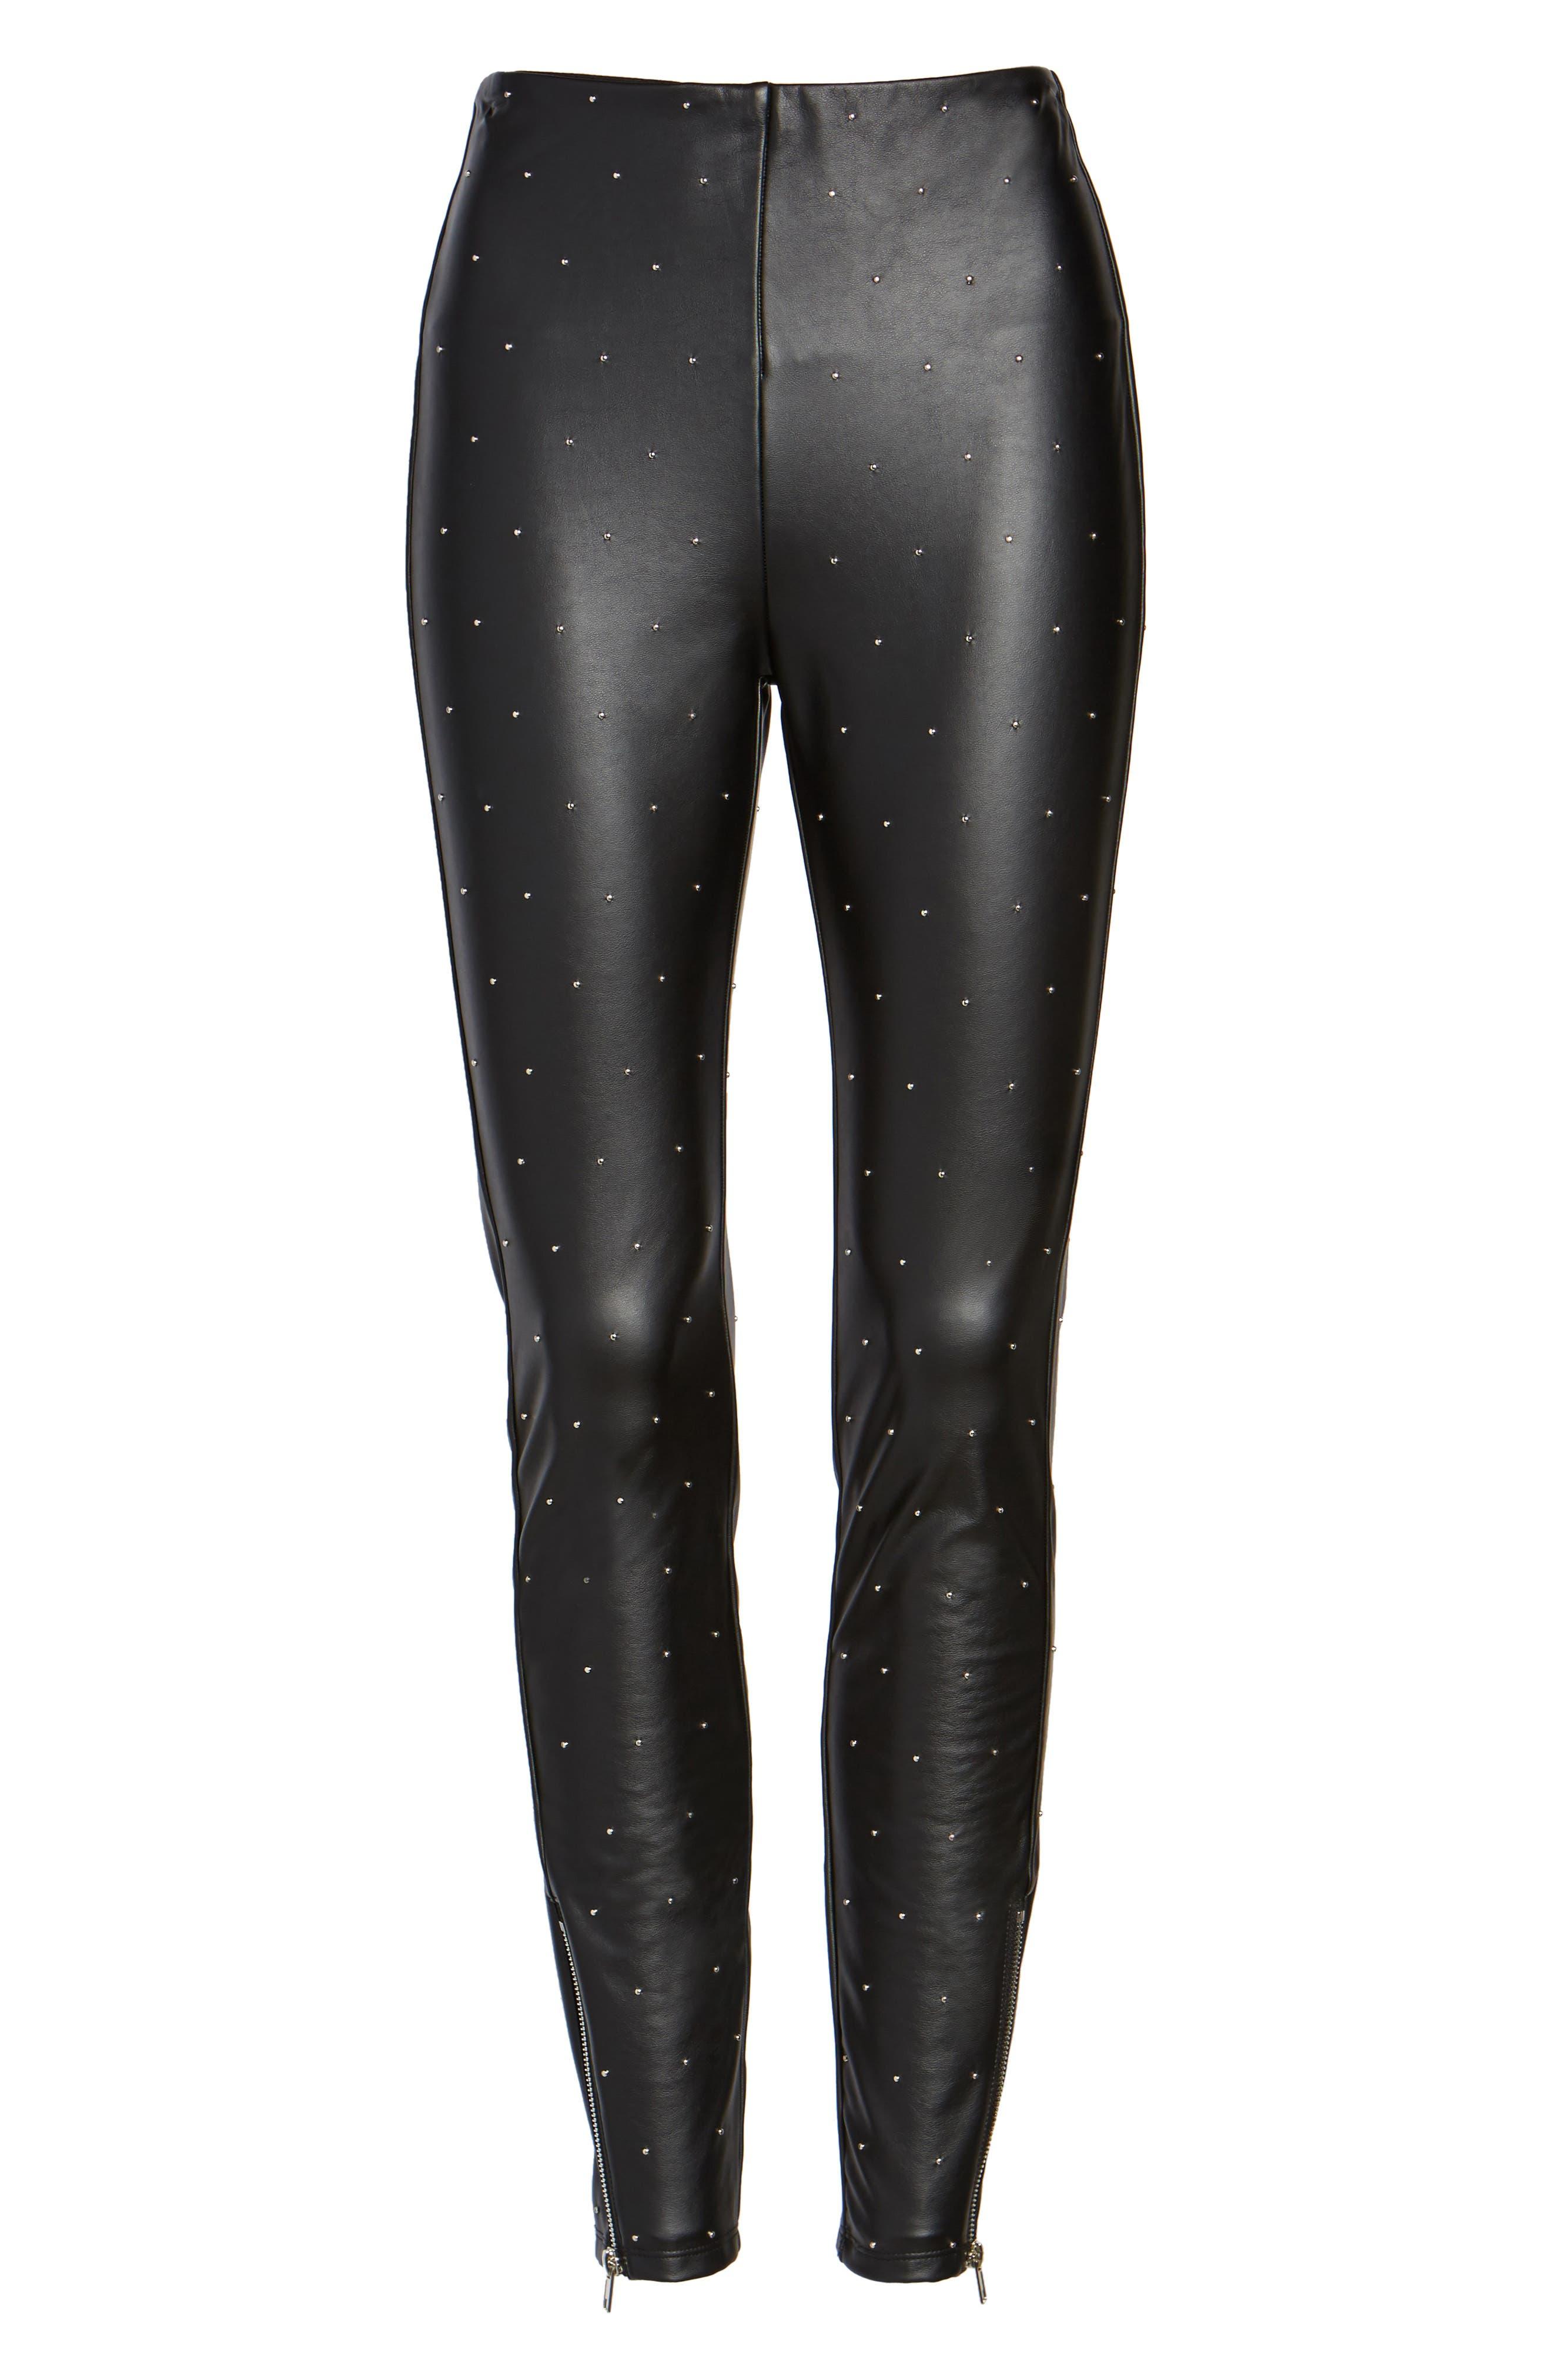 Bowery Studded High Waist Leggings,                             Alternate thumbnail 6, color,                             Silver Dot